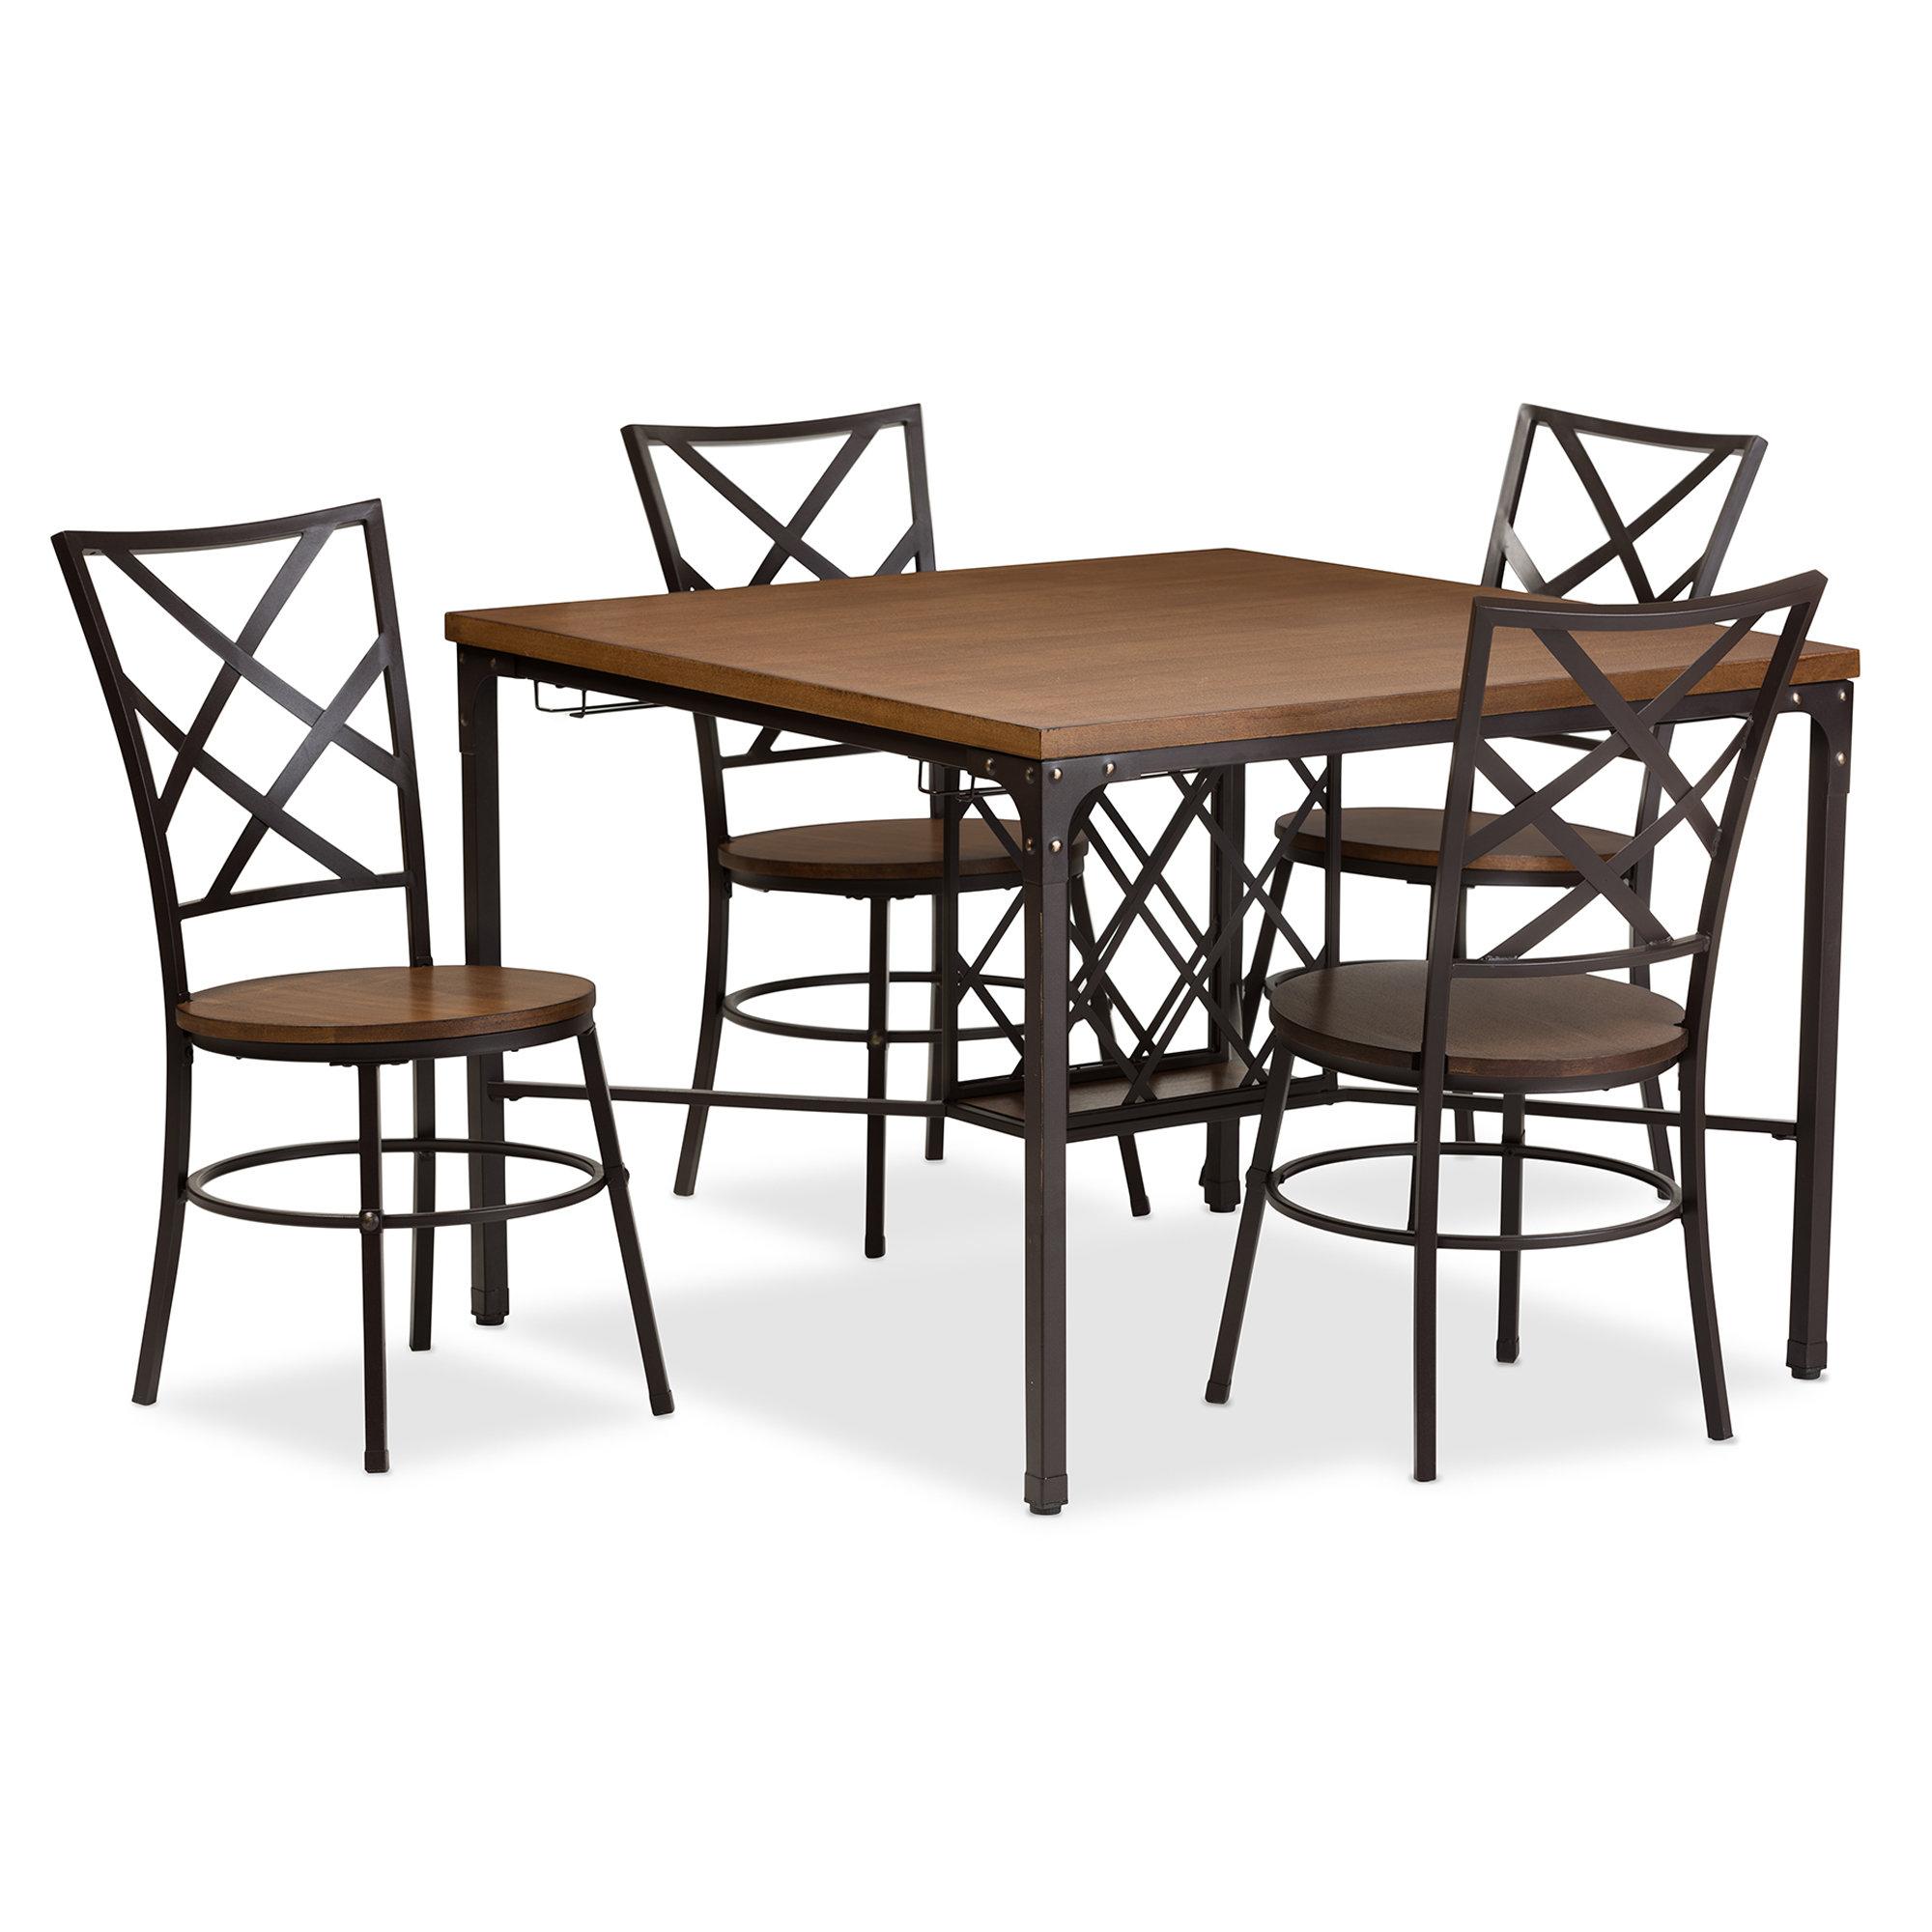 Calla 5 Piece Dining Set Regarding 2017 Ephraim 5 Piece Dining Sets (Image 5 of 20)